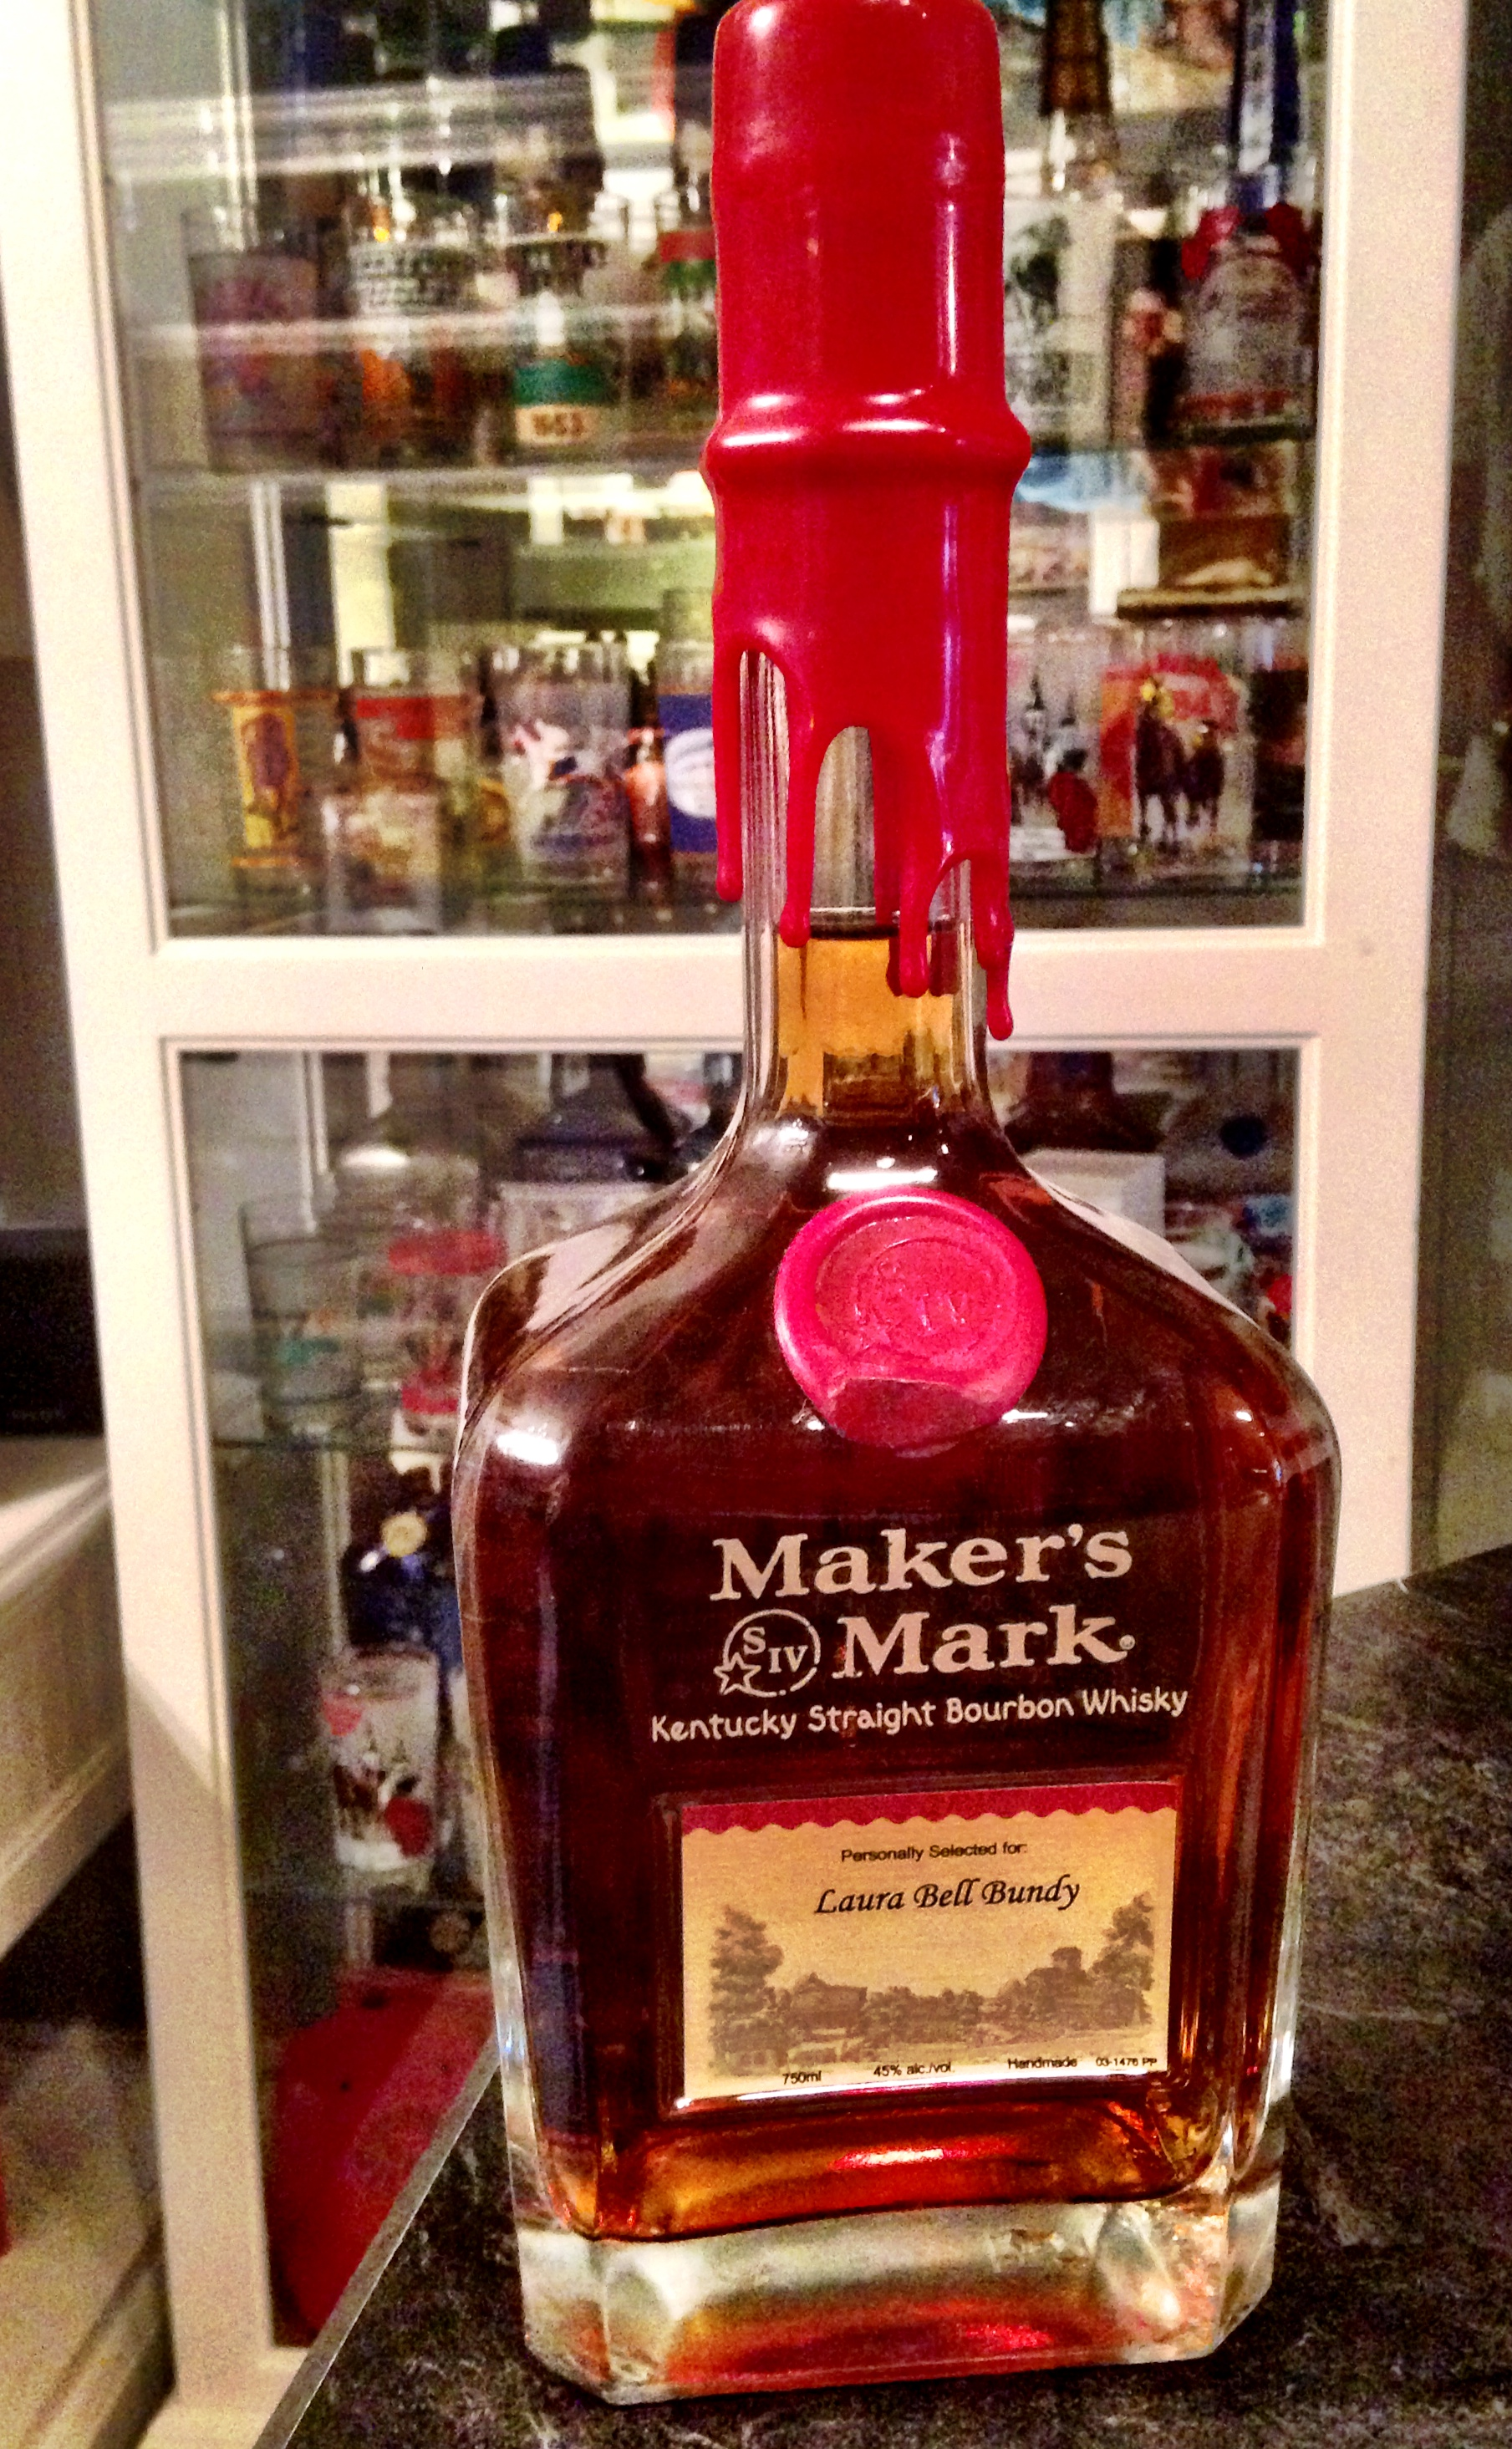 2014-09-16-makersmark.JPG